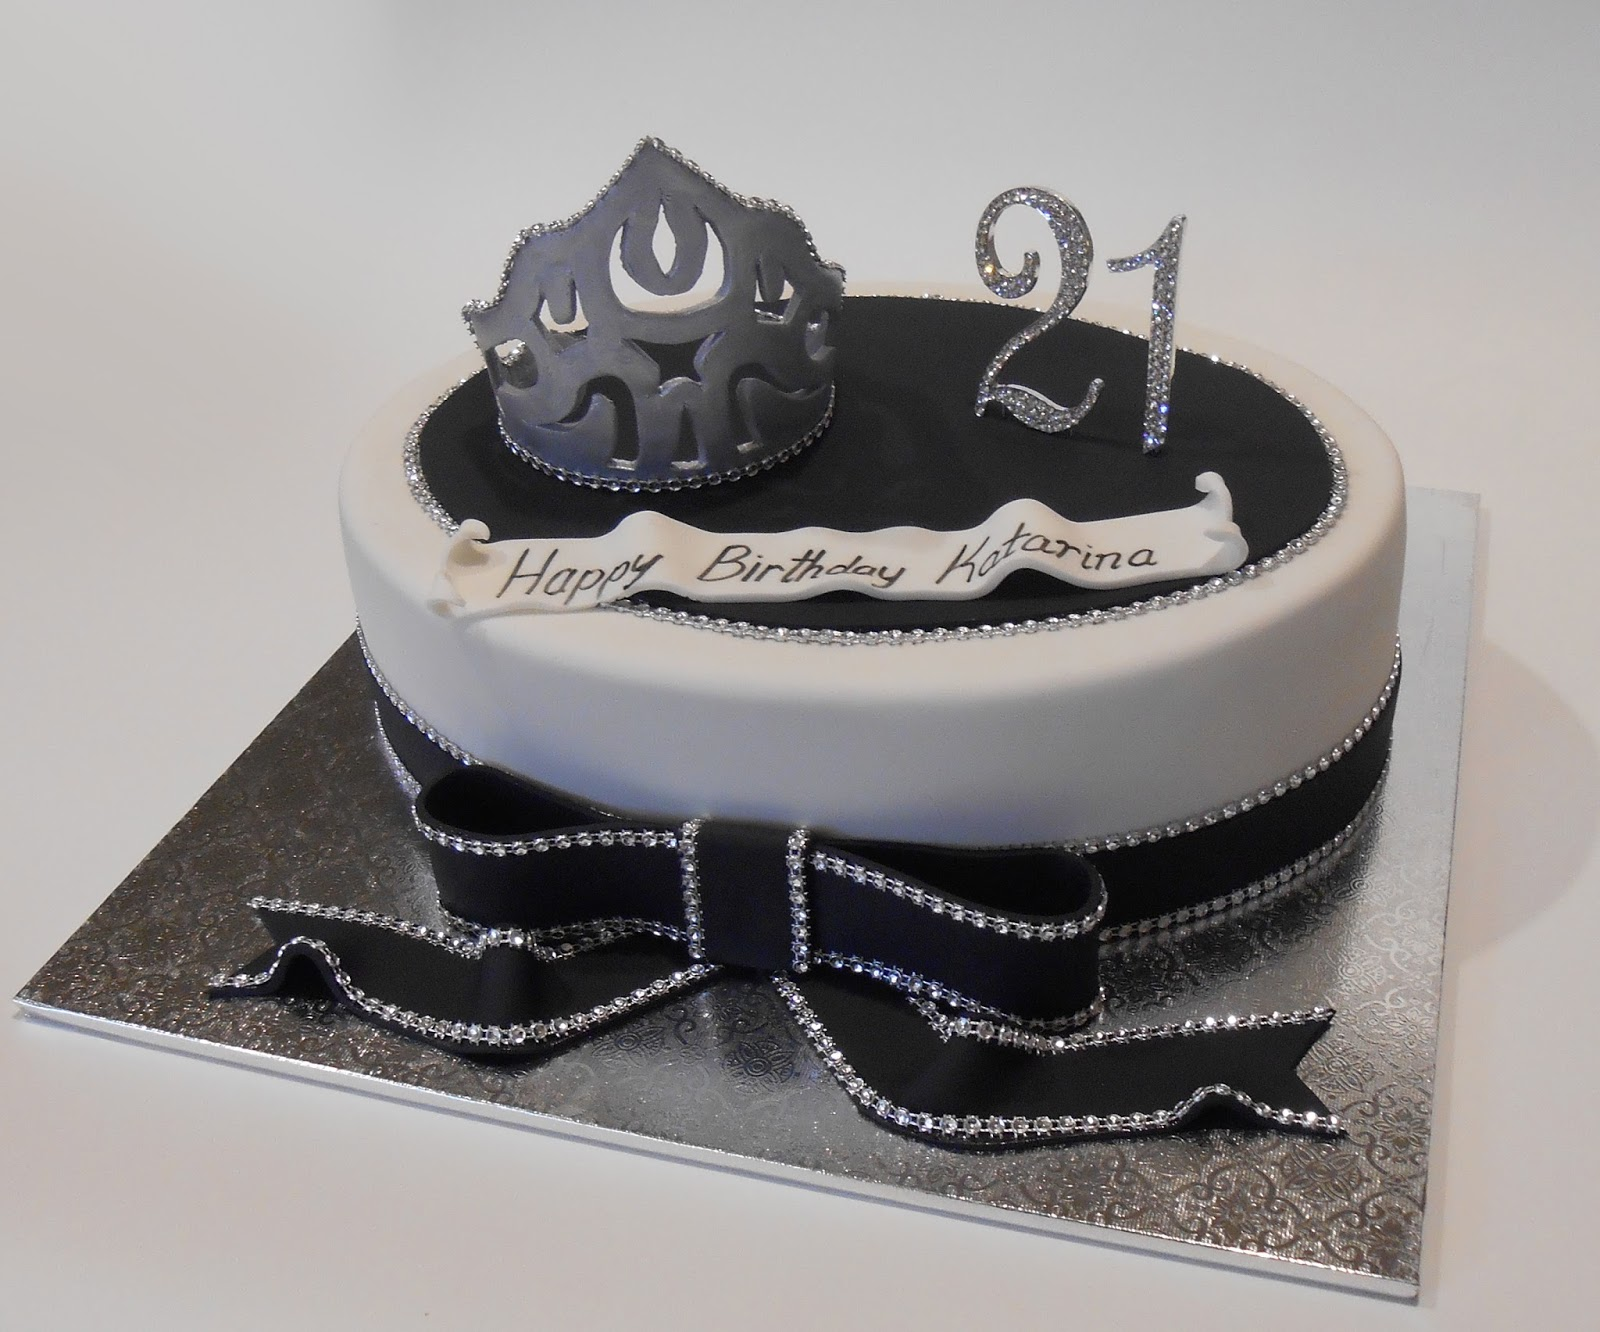 Nadas Cakes Black White Bling Birthday Cake By Nadas Cakes